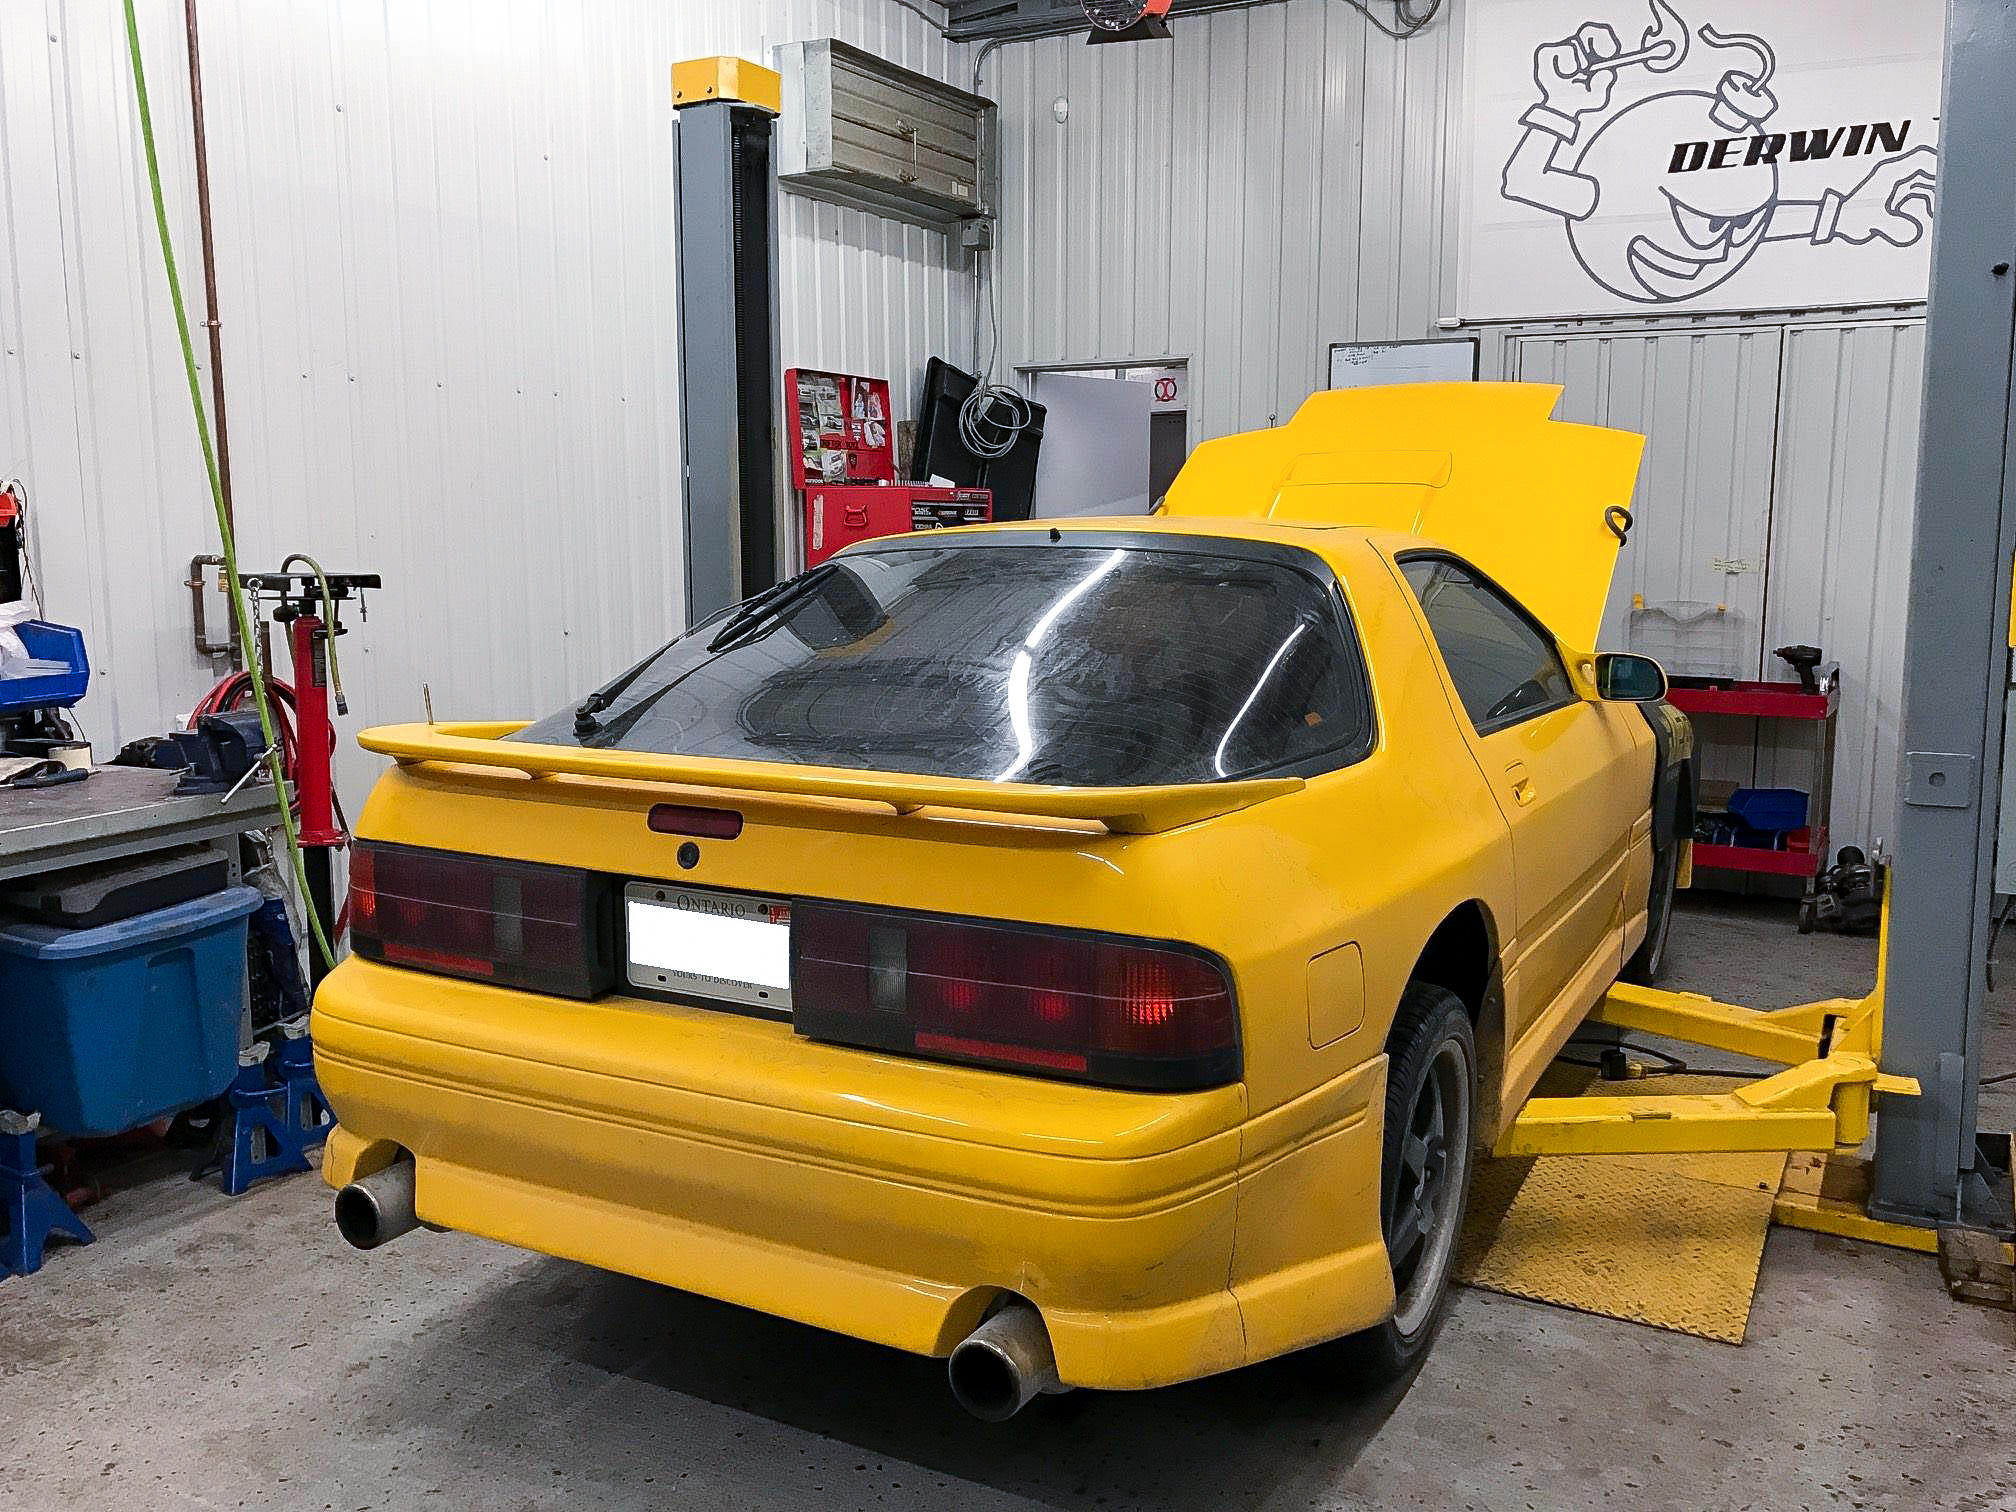 RX7 FC TII 1988 yellow single turbo 240whp – Derwin